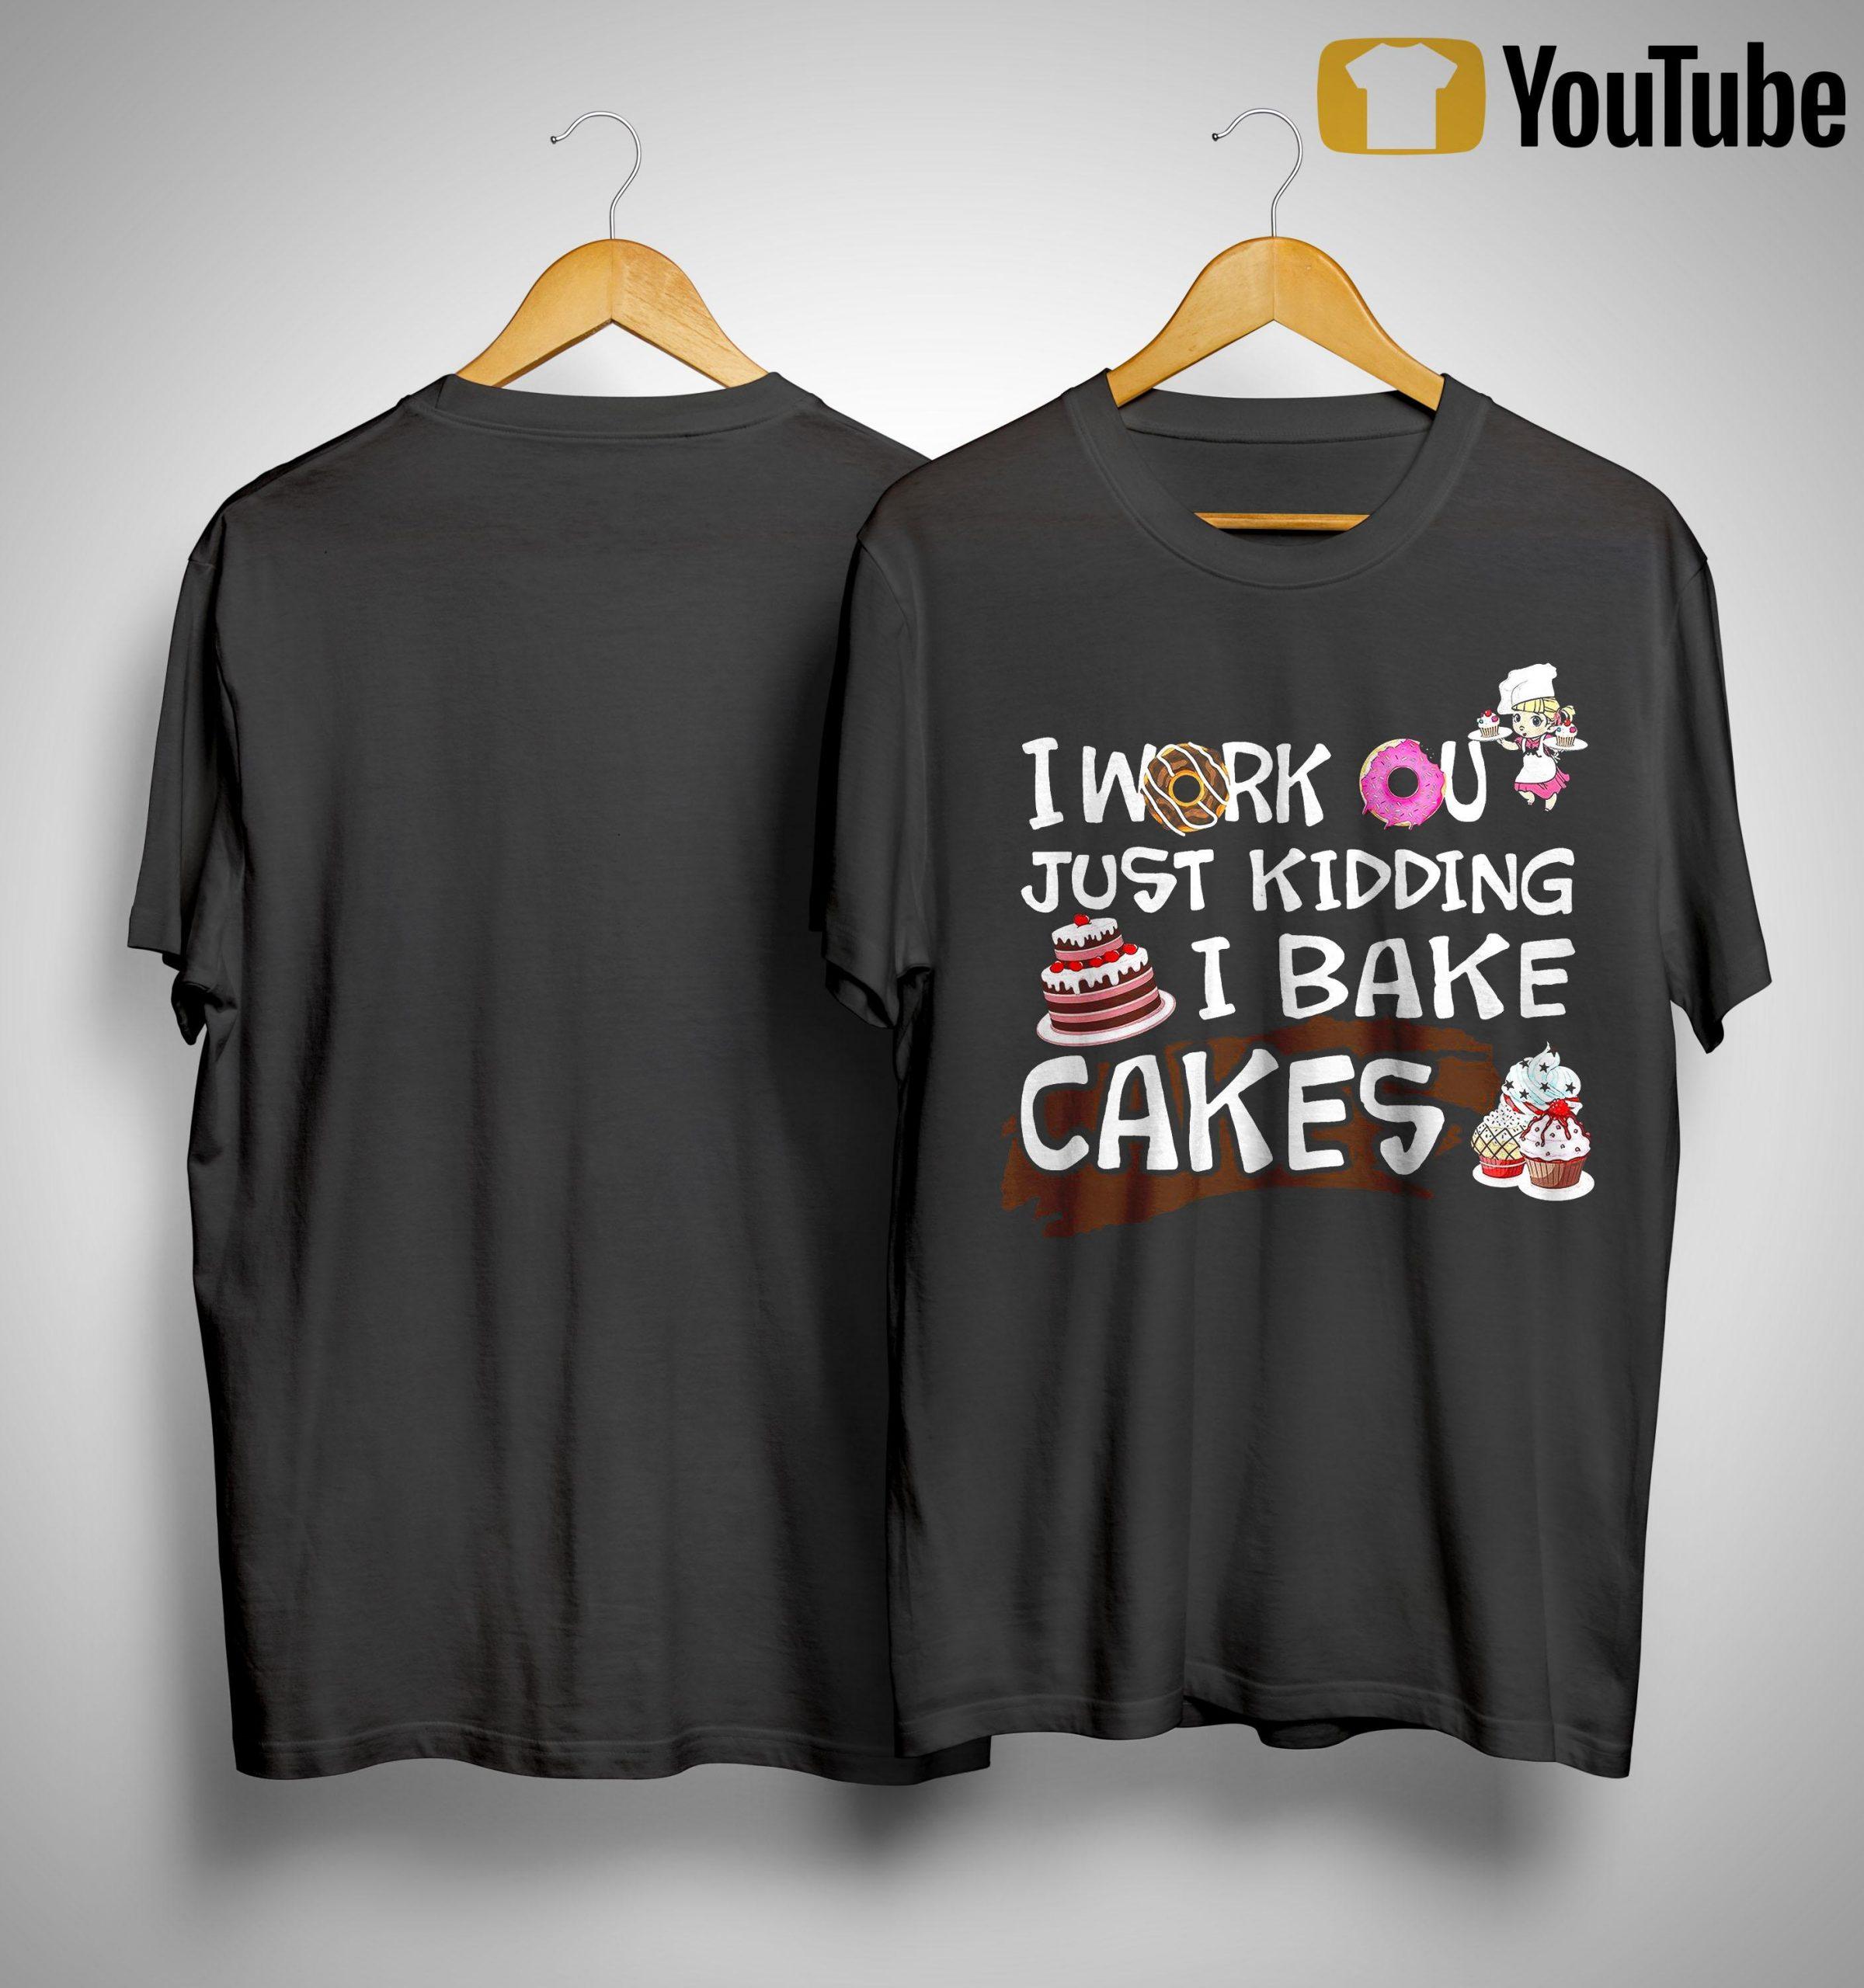 I Work Out Just Kidding I Bake Cakes Shirt